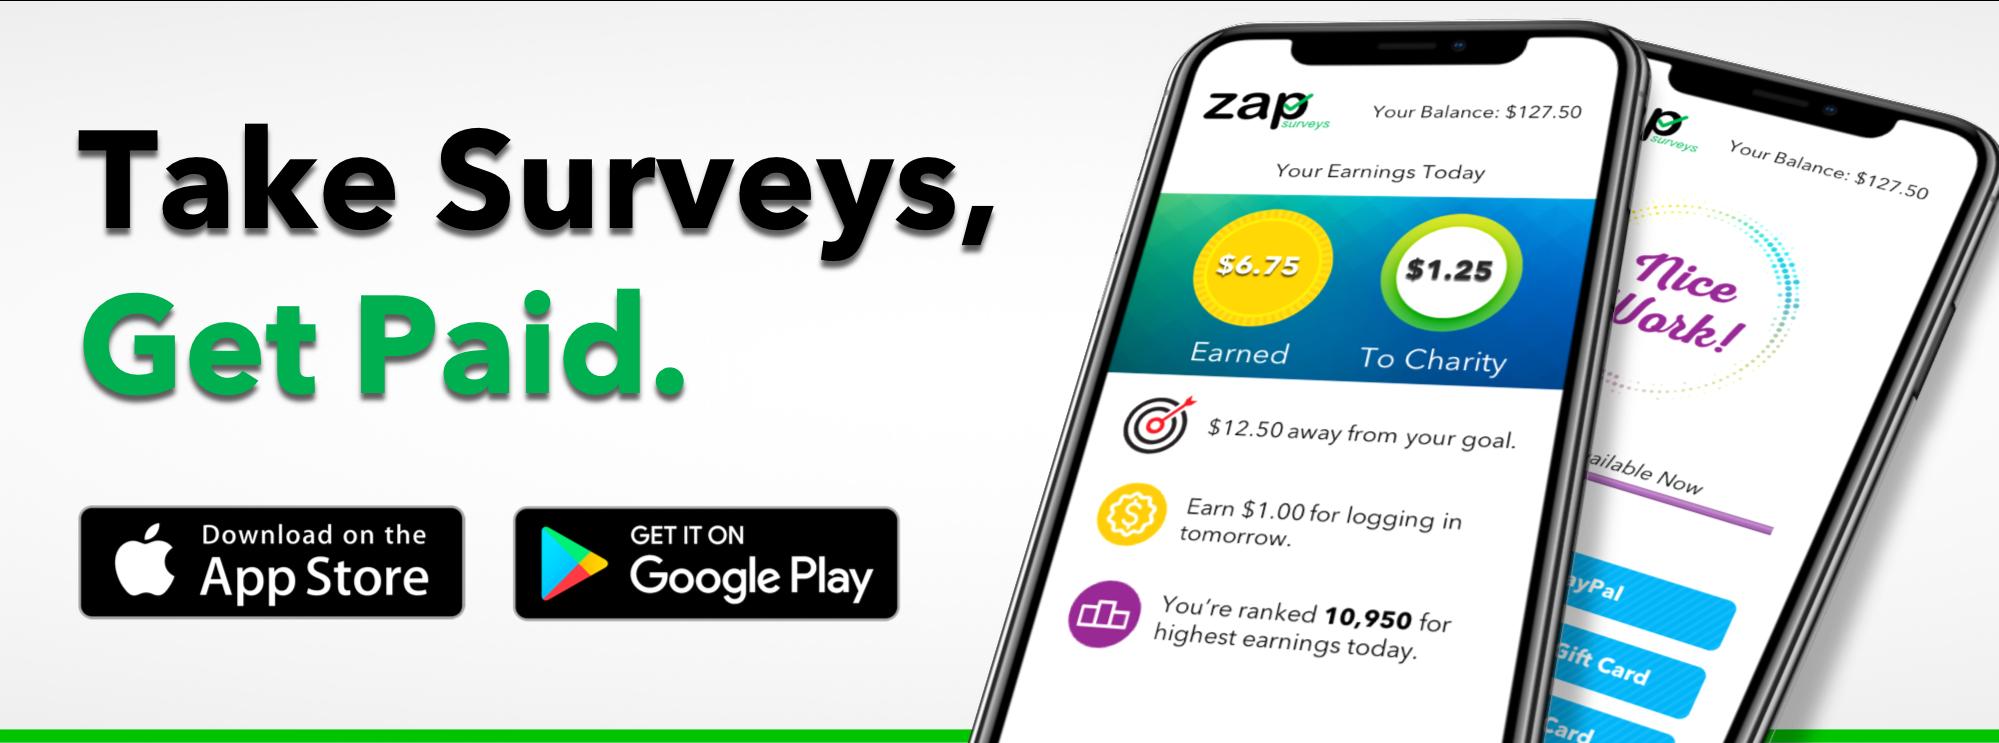 Zap Surveys Survey apps that pay, Apps that pay, Take